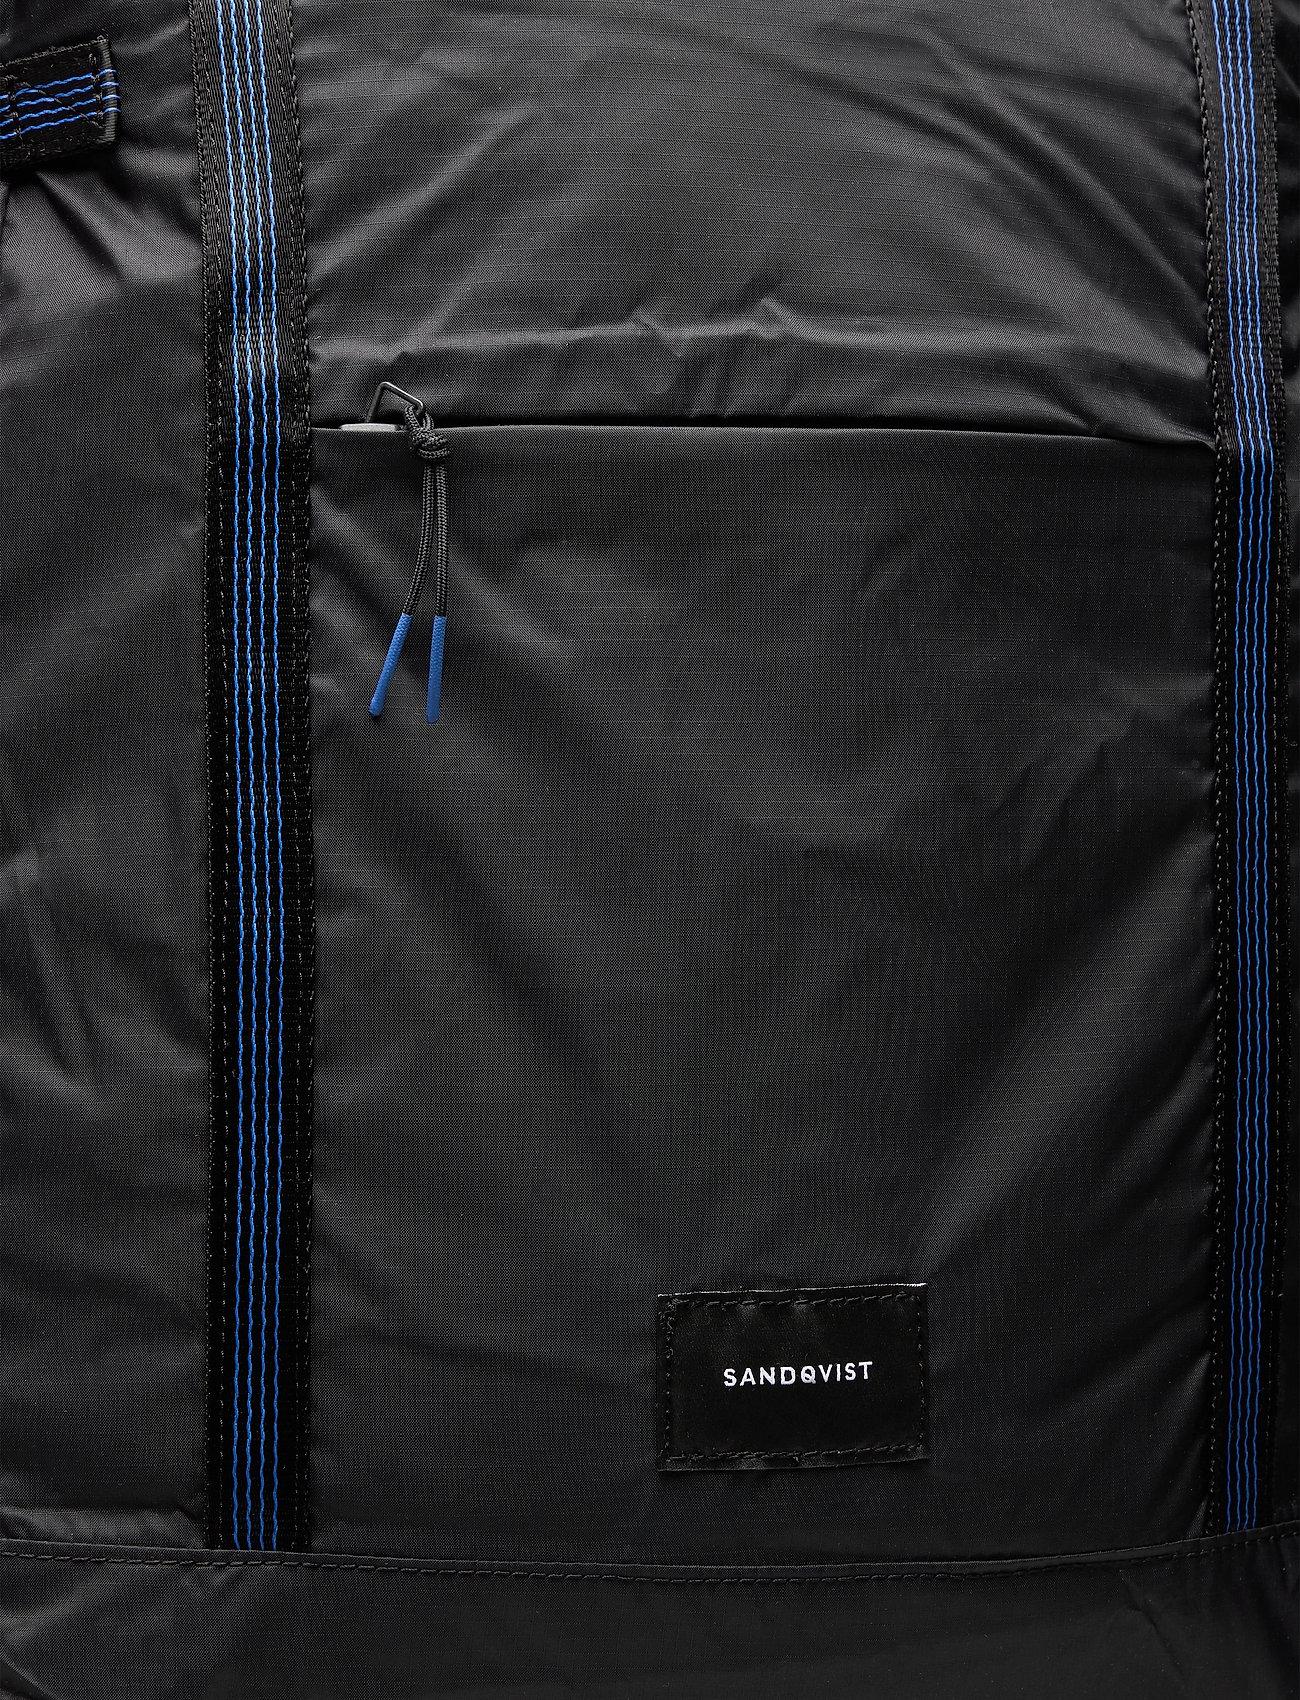 SANDQVIST - ROGER LIGHTWEIGHT - bags - black - 3